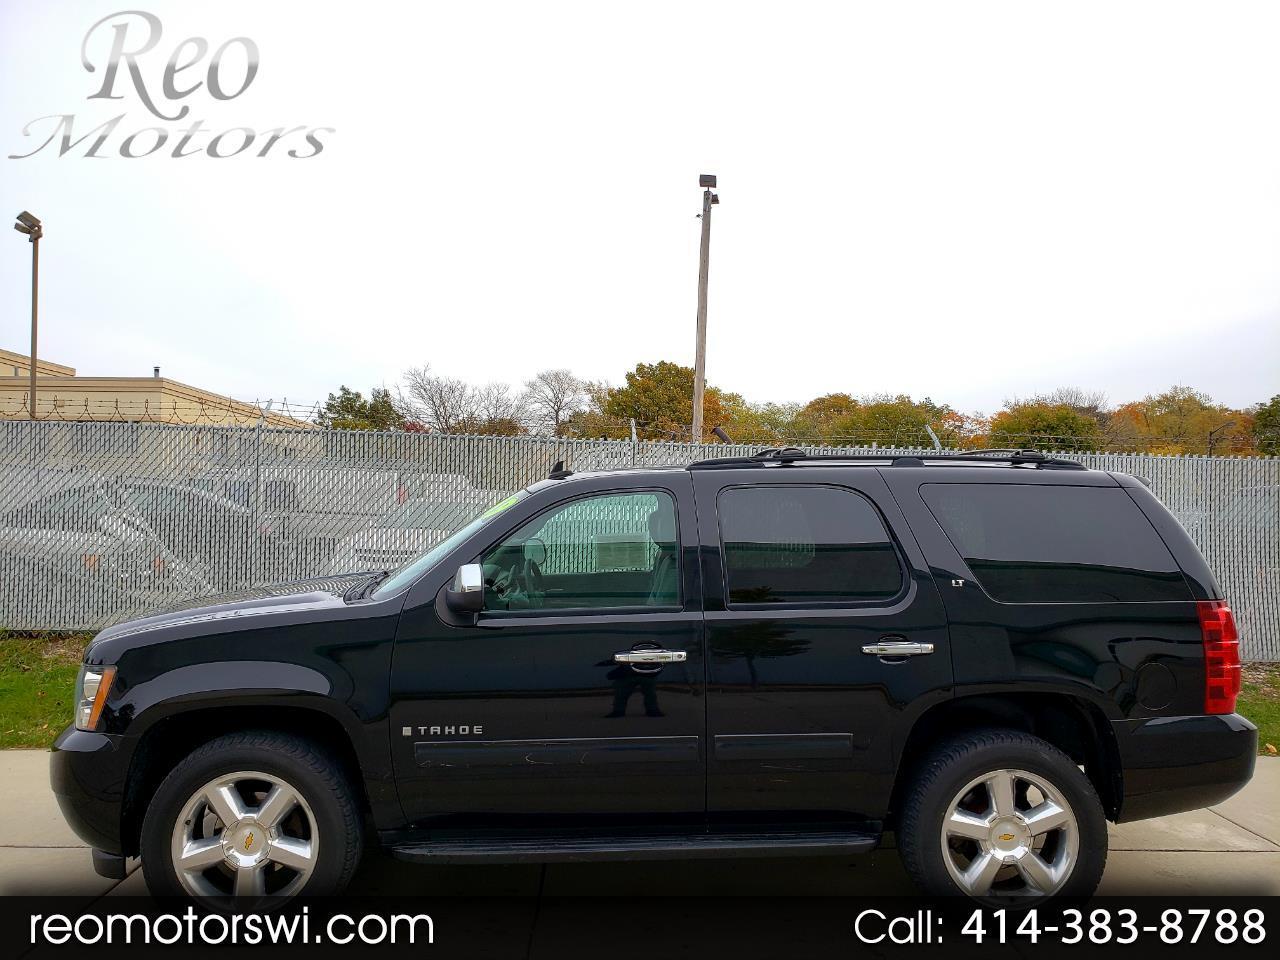 2009 Chevrolet Tahoe LT 4WD